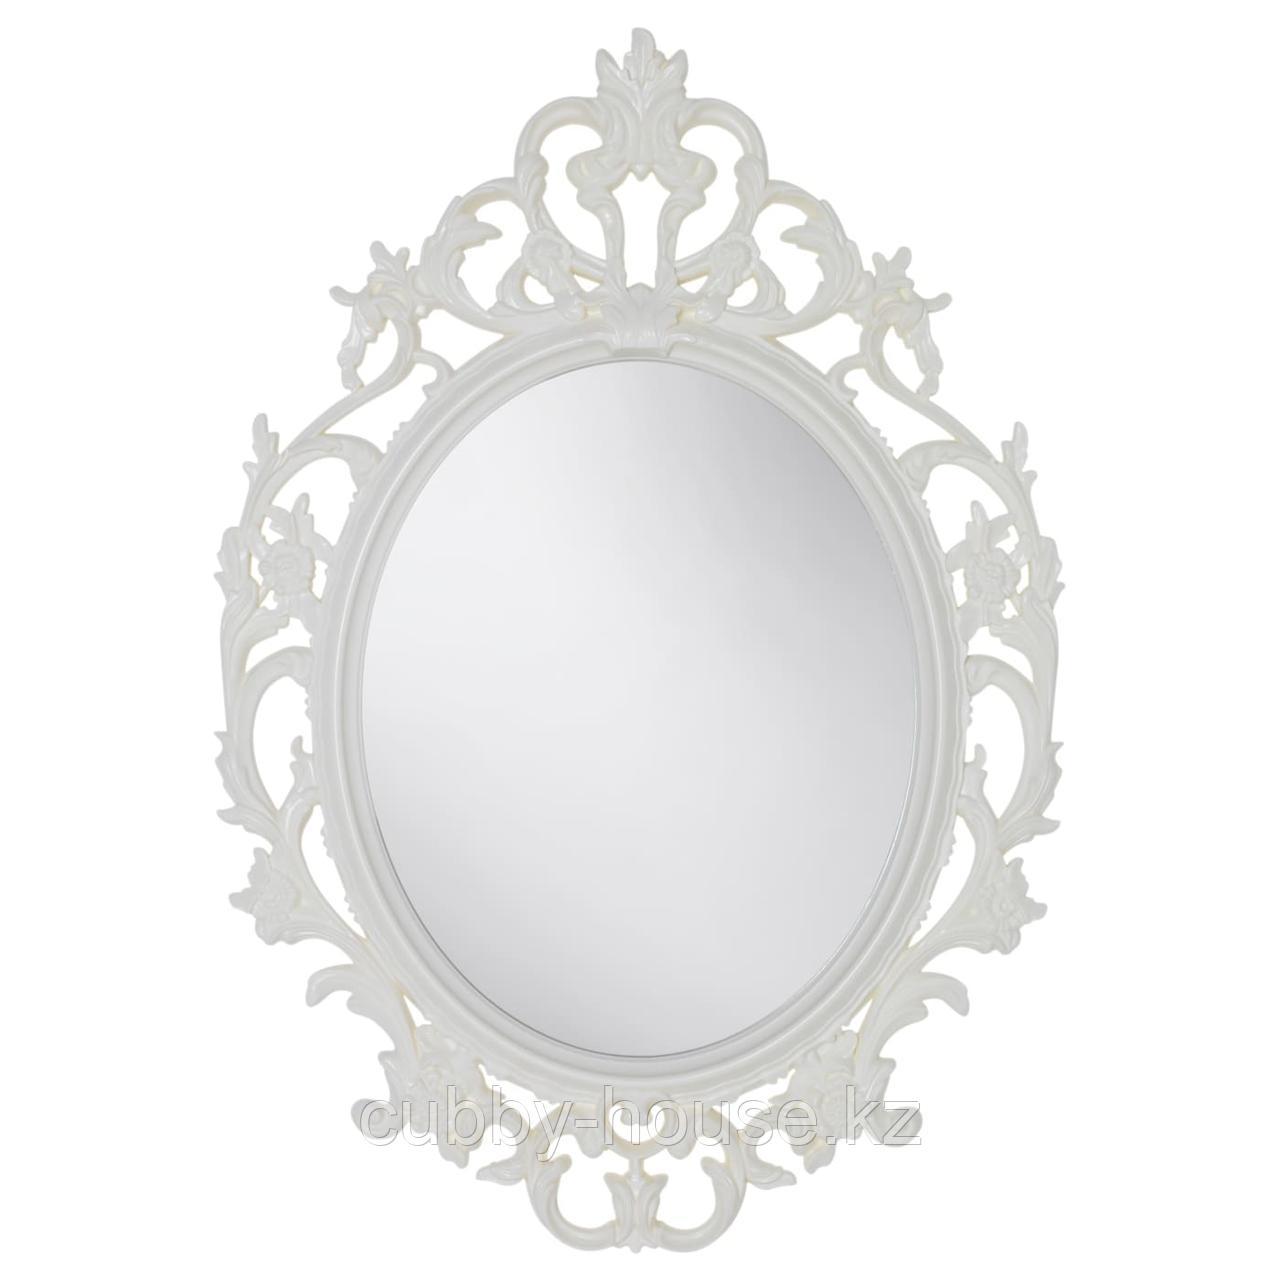 ВИКЕРСУНД Зеркало, овал, белый, 59x85 см